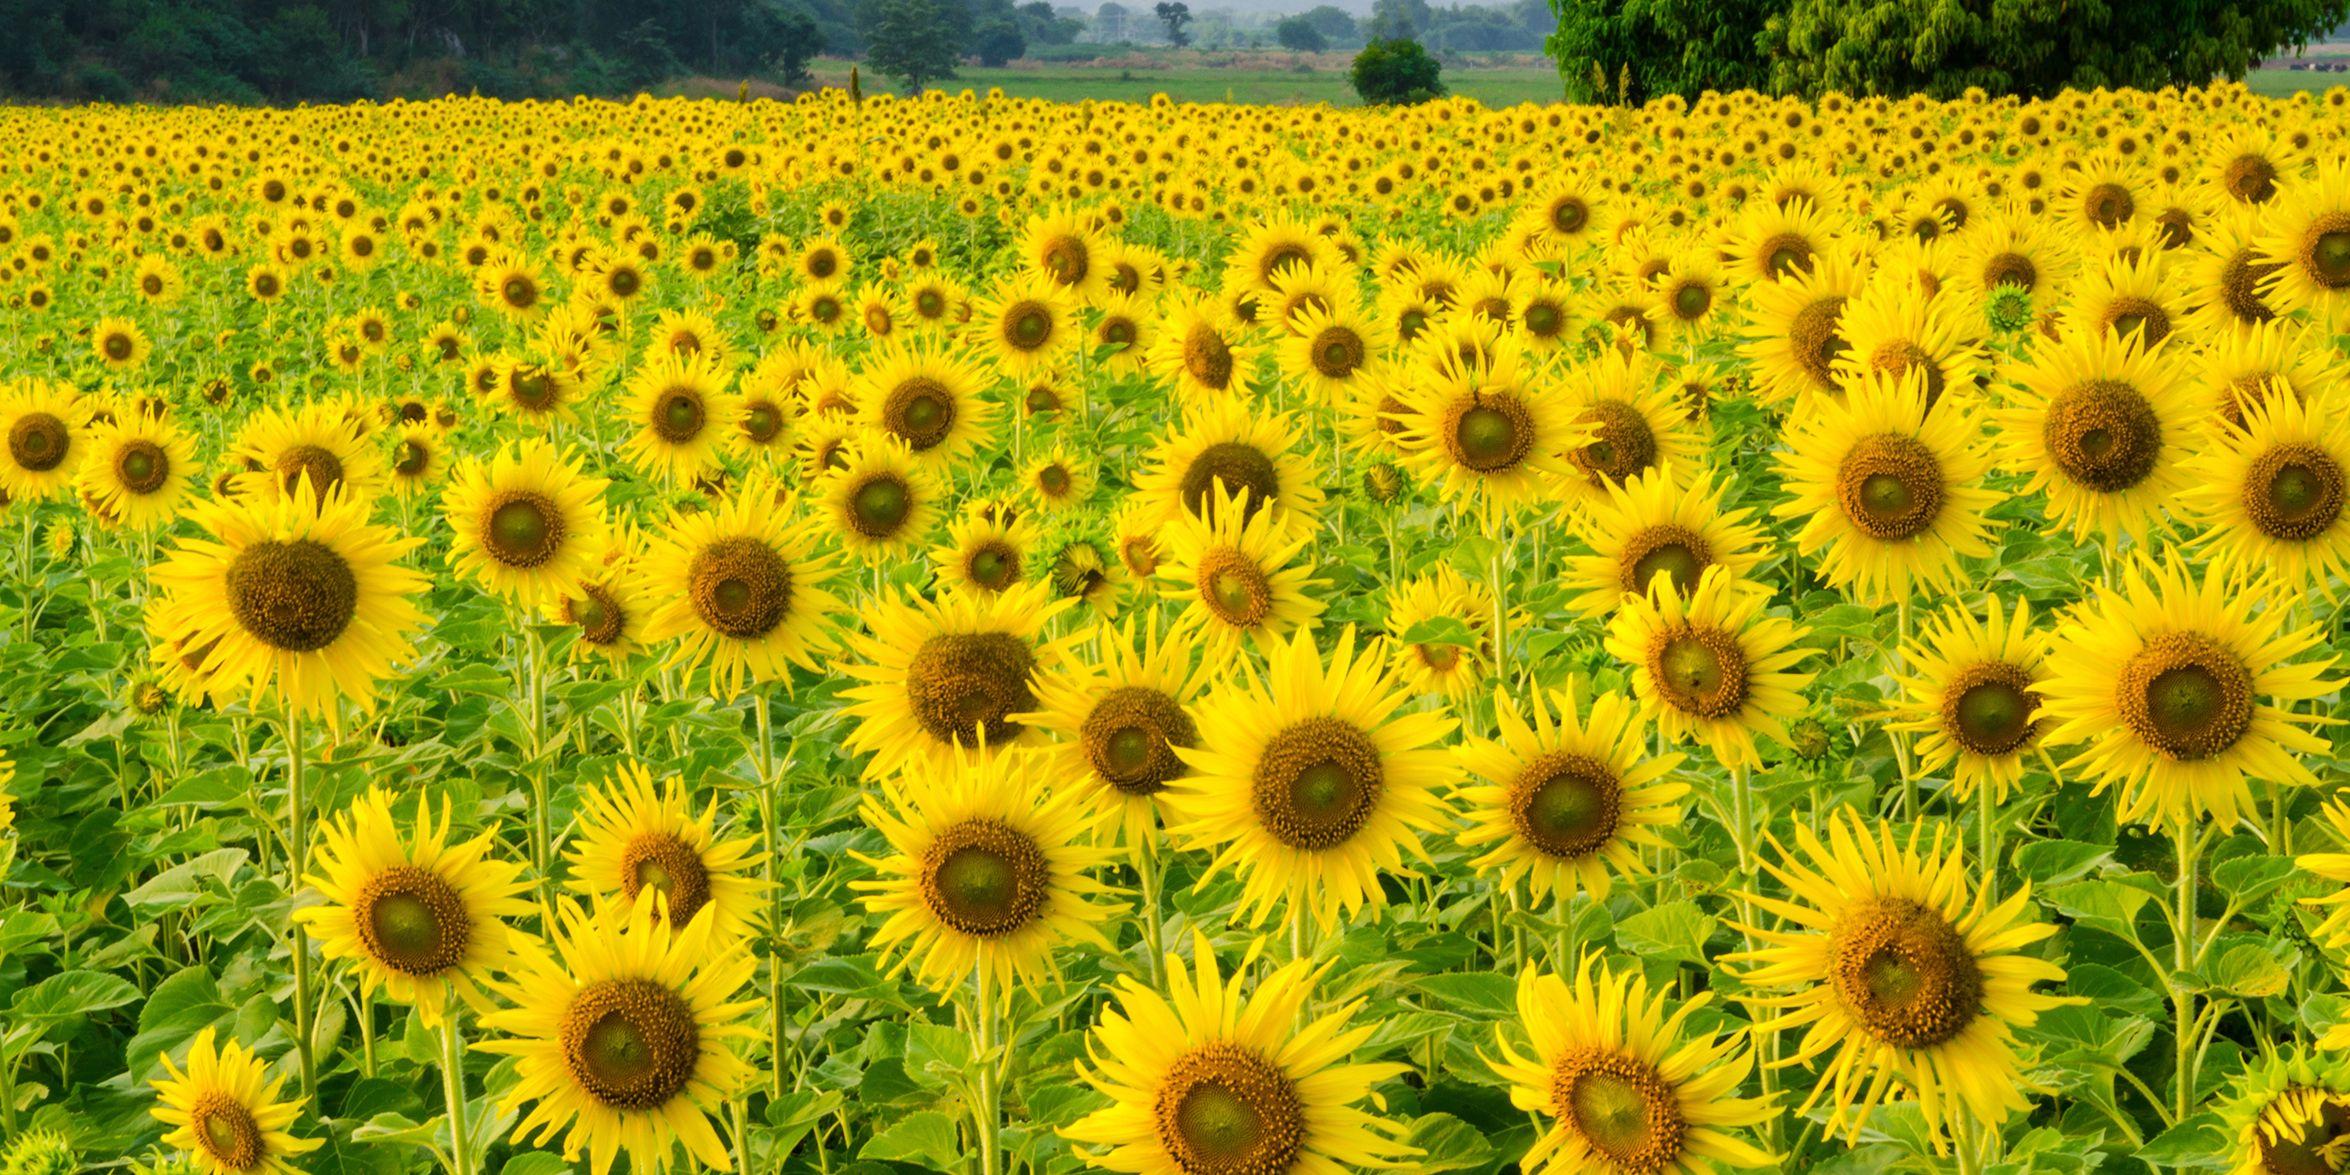 sunflower field near me anderson sunflower farm georgia